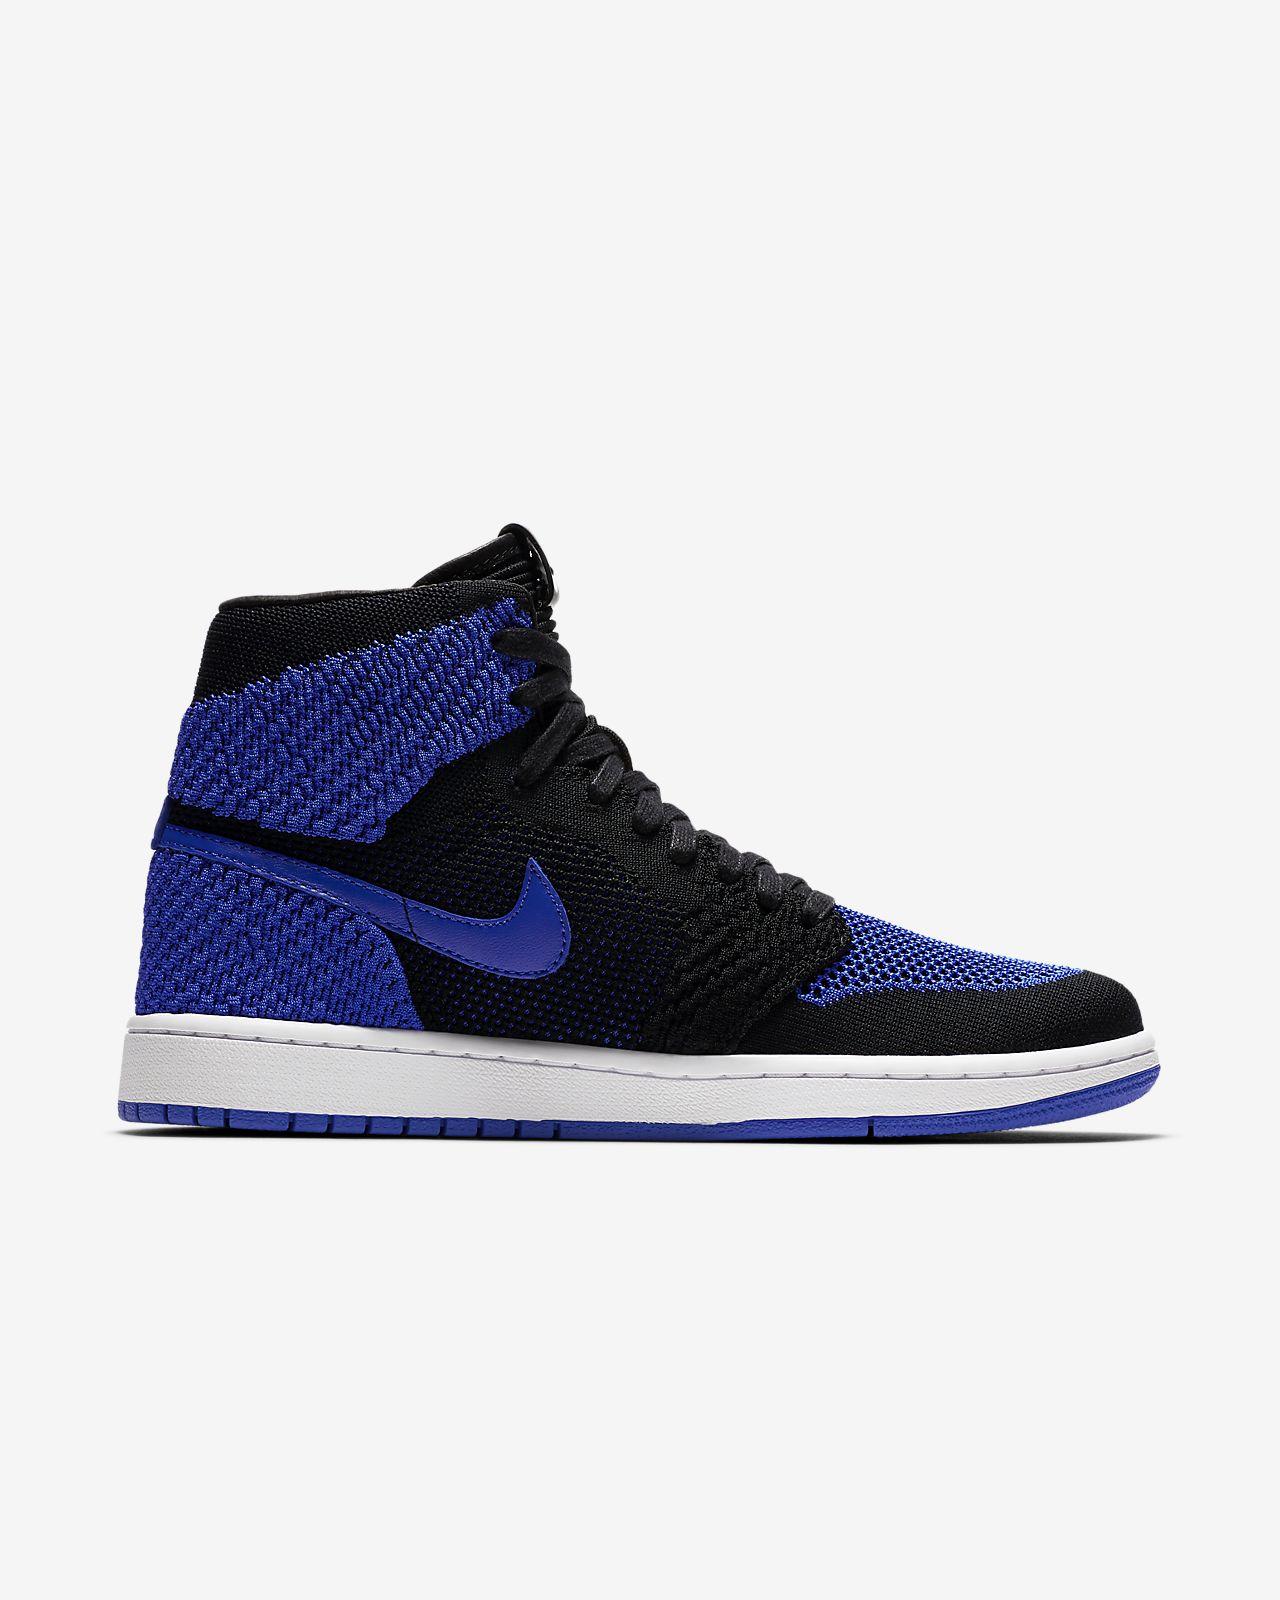 65c3ea9f567 Air Jordan 1 Retro High Flyknit Men s Shoe. Nike.com GB